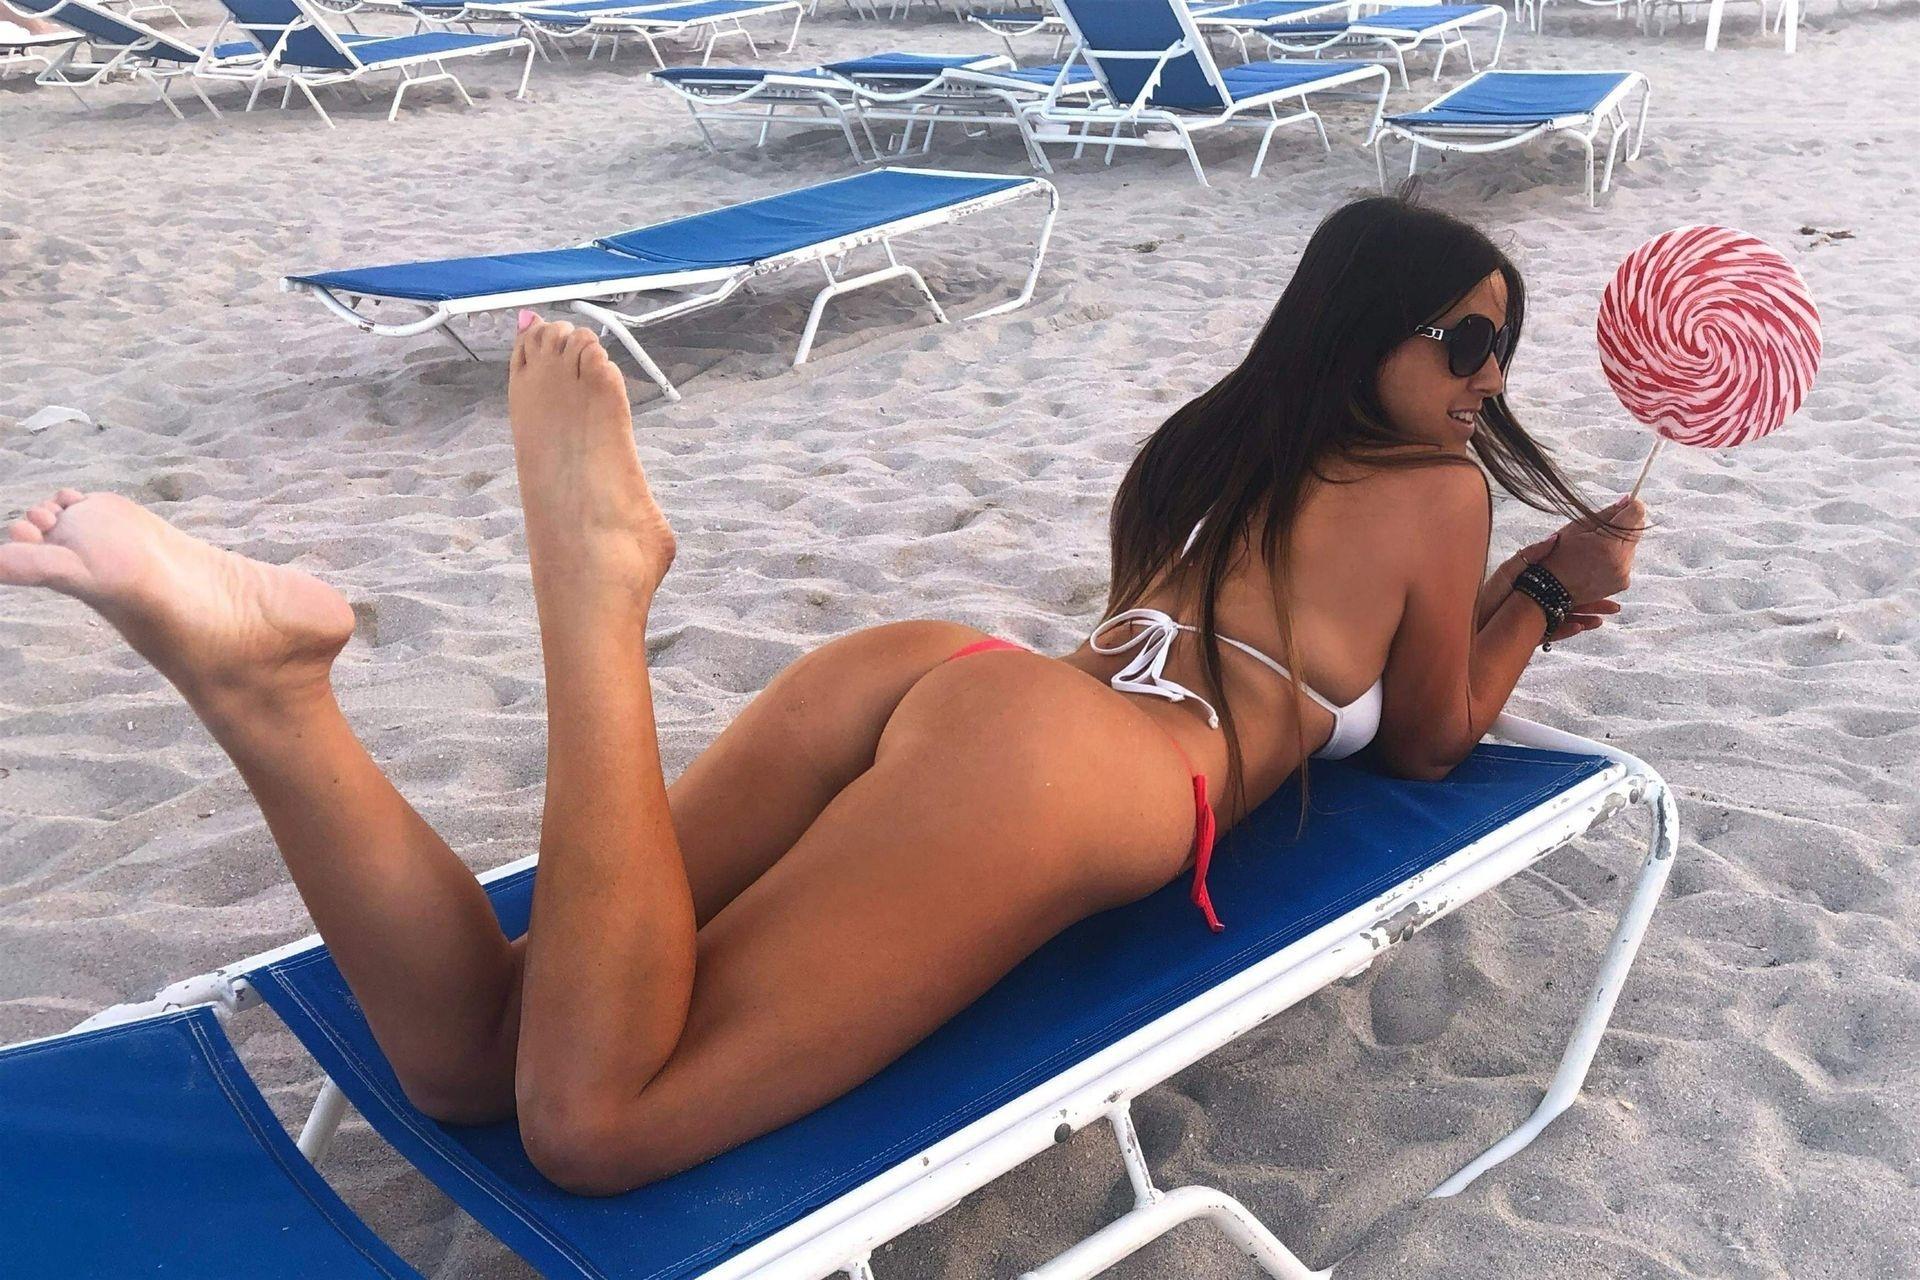 Claudia Romani Bikini Pics, Curves